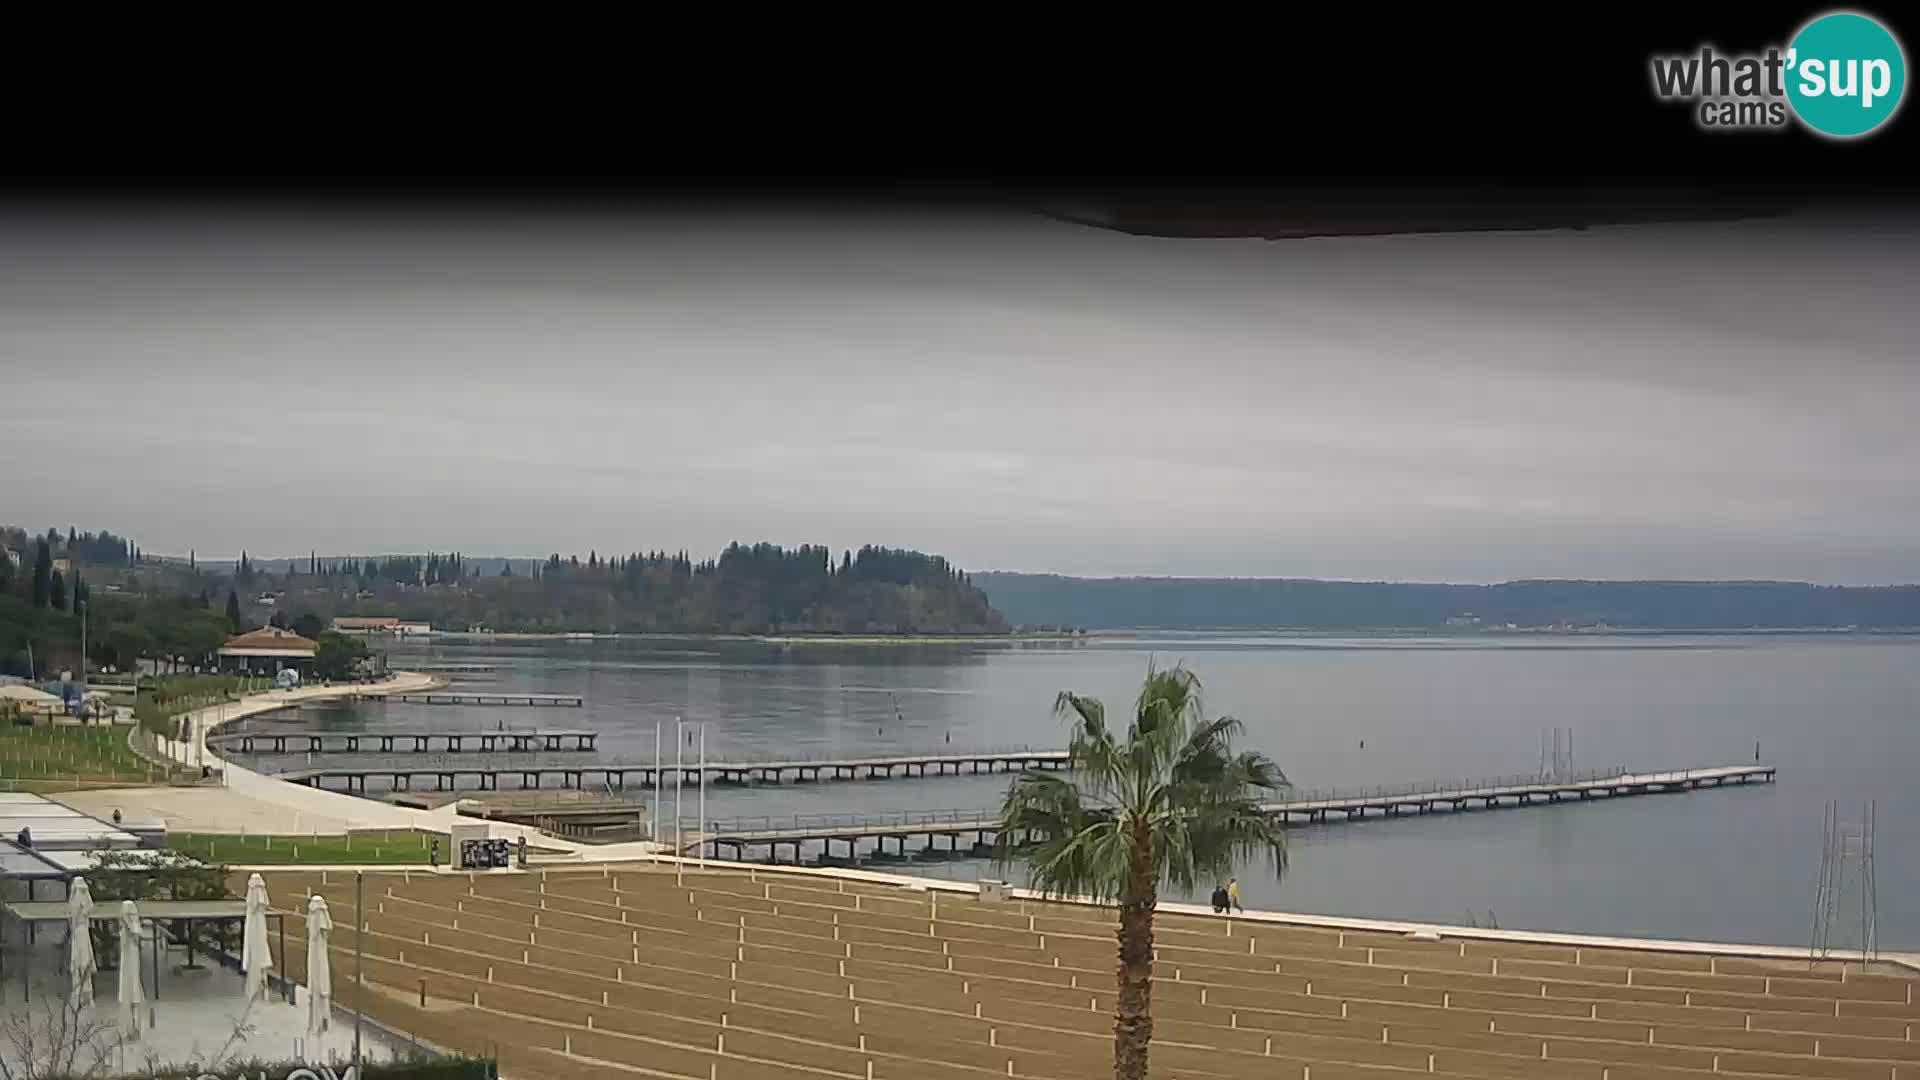 Plage Portorož live cam